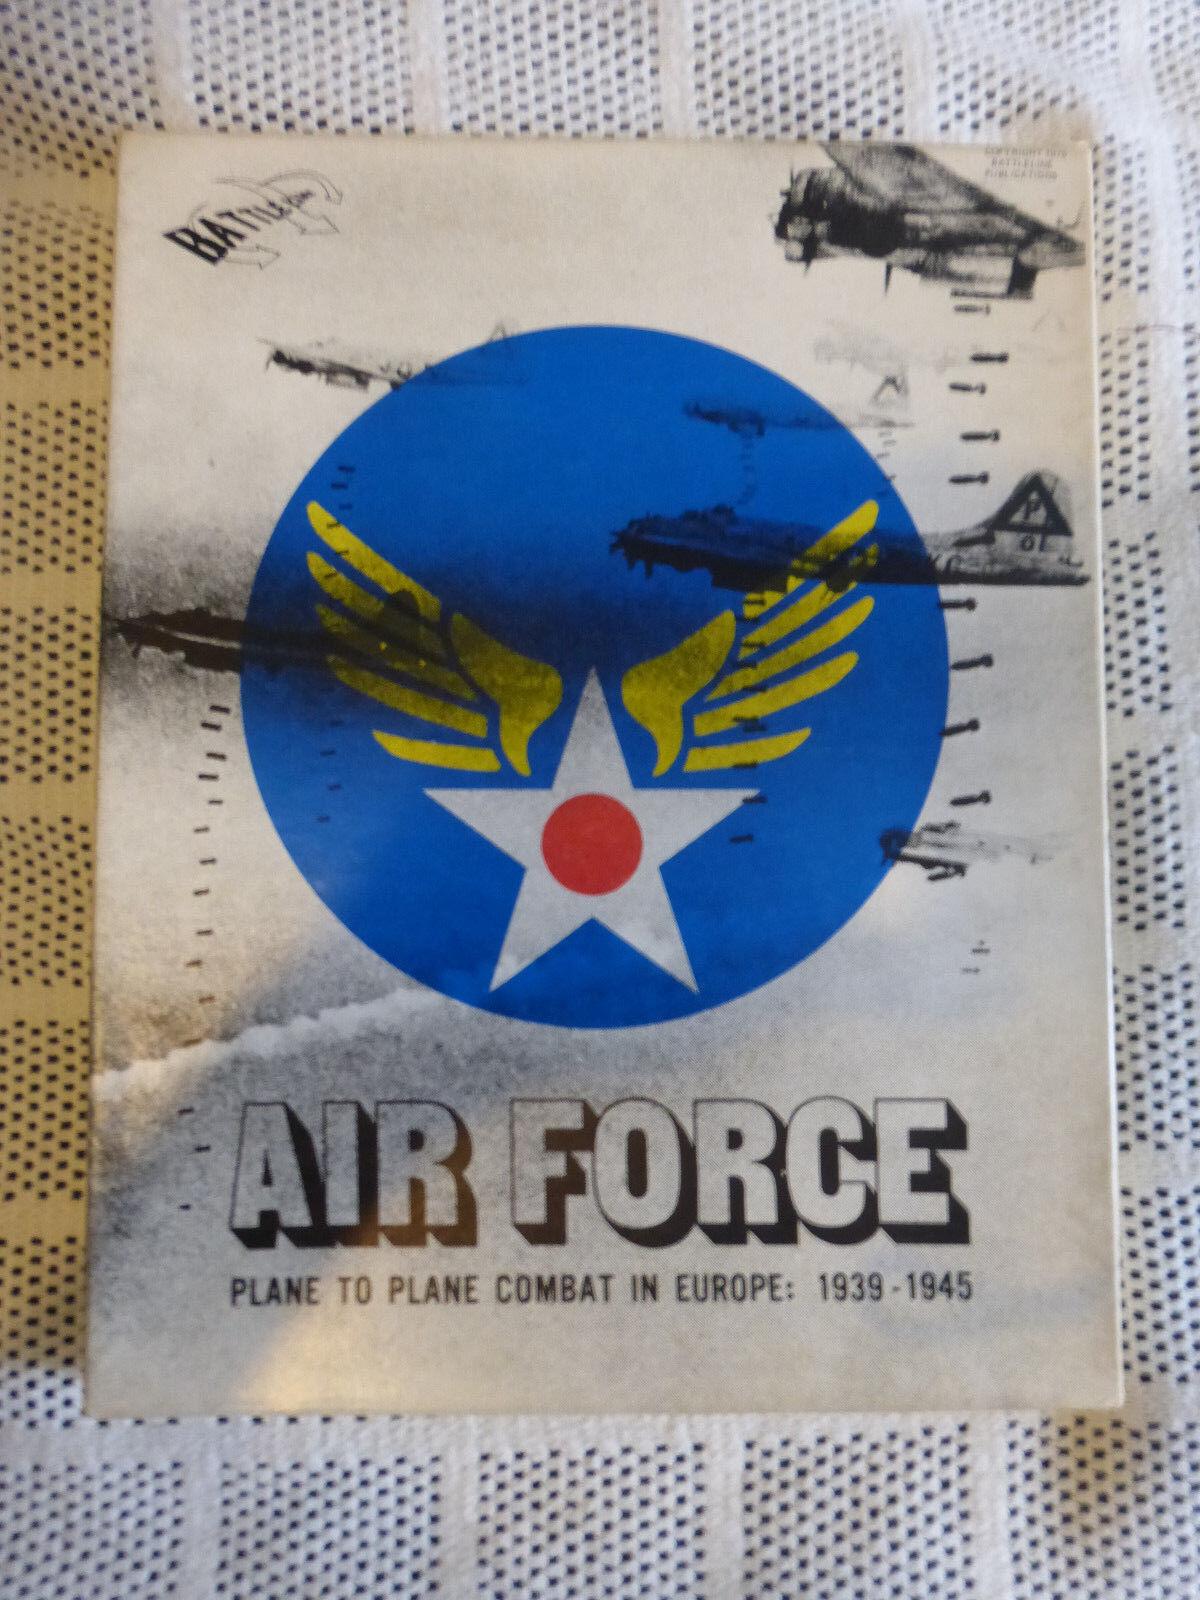 Fuerza aérea por Battleline Juegos (no Avalon Hill versión) Segunda Guerra Mundial juego de guerra completa